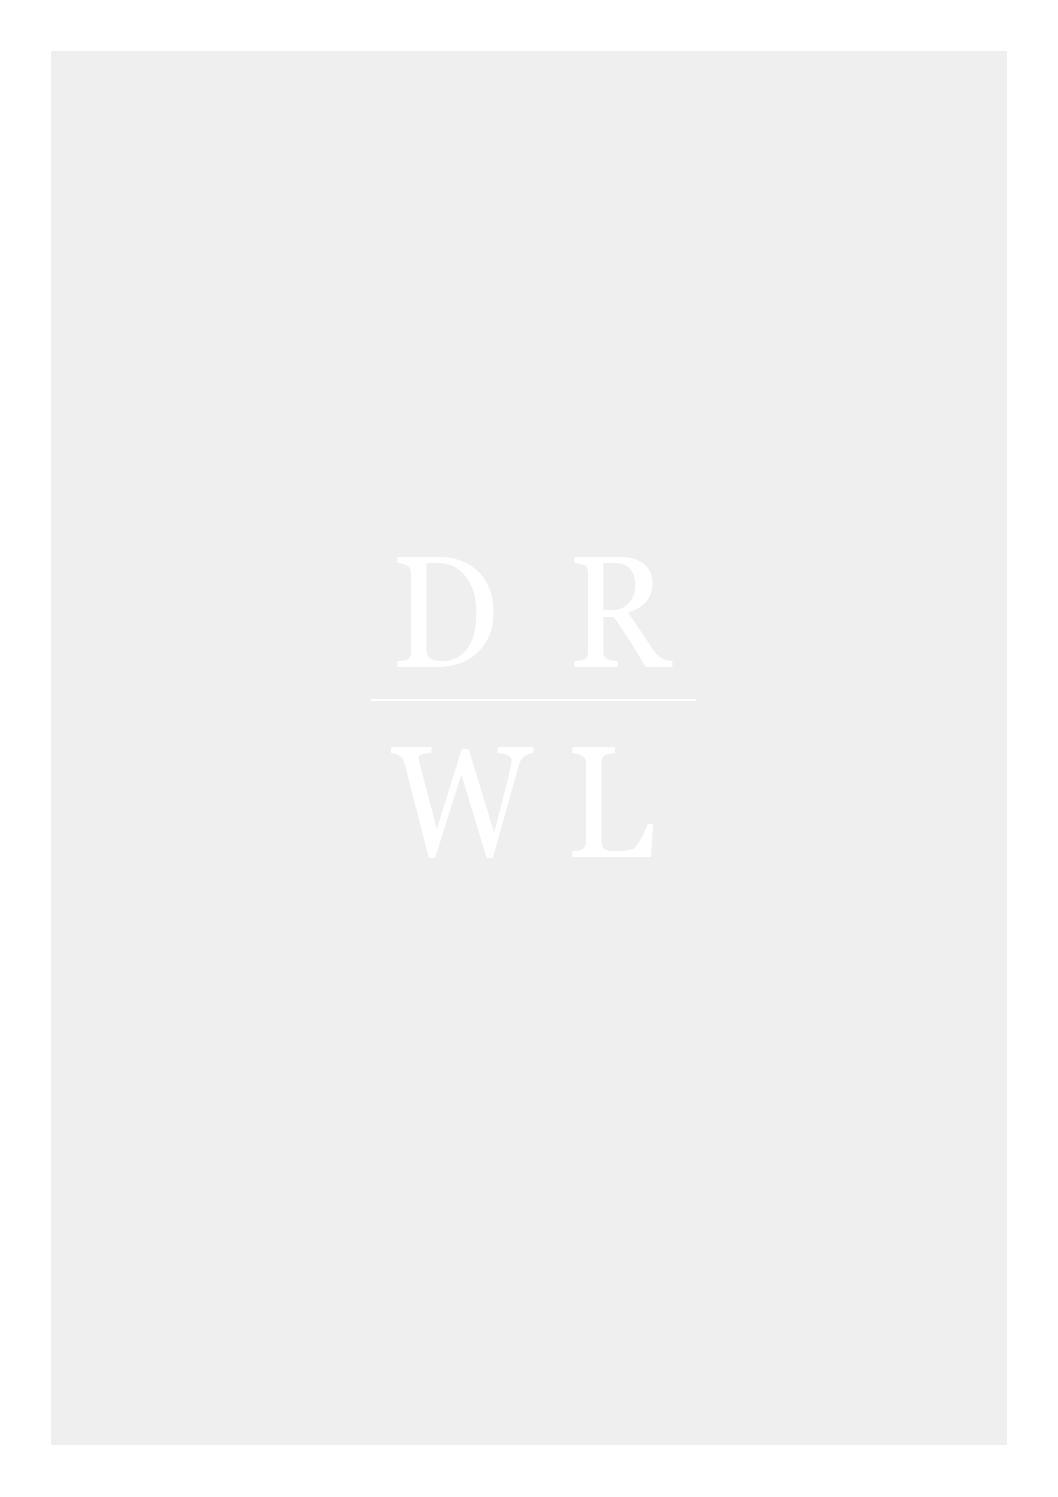 drw loader portfolio by daniel loader - issuu